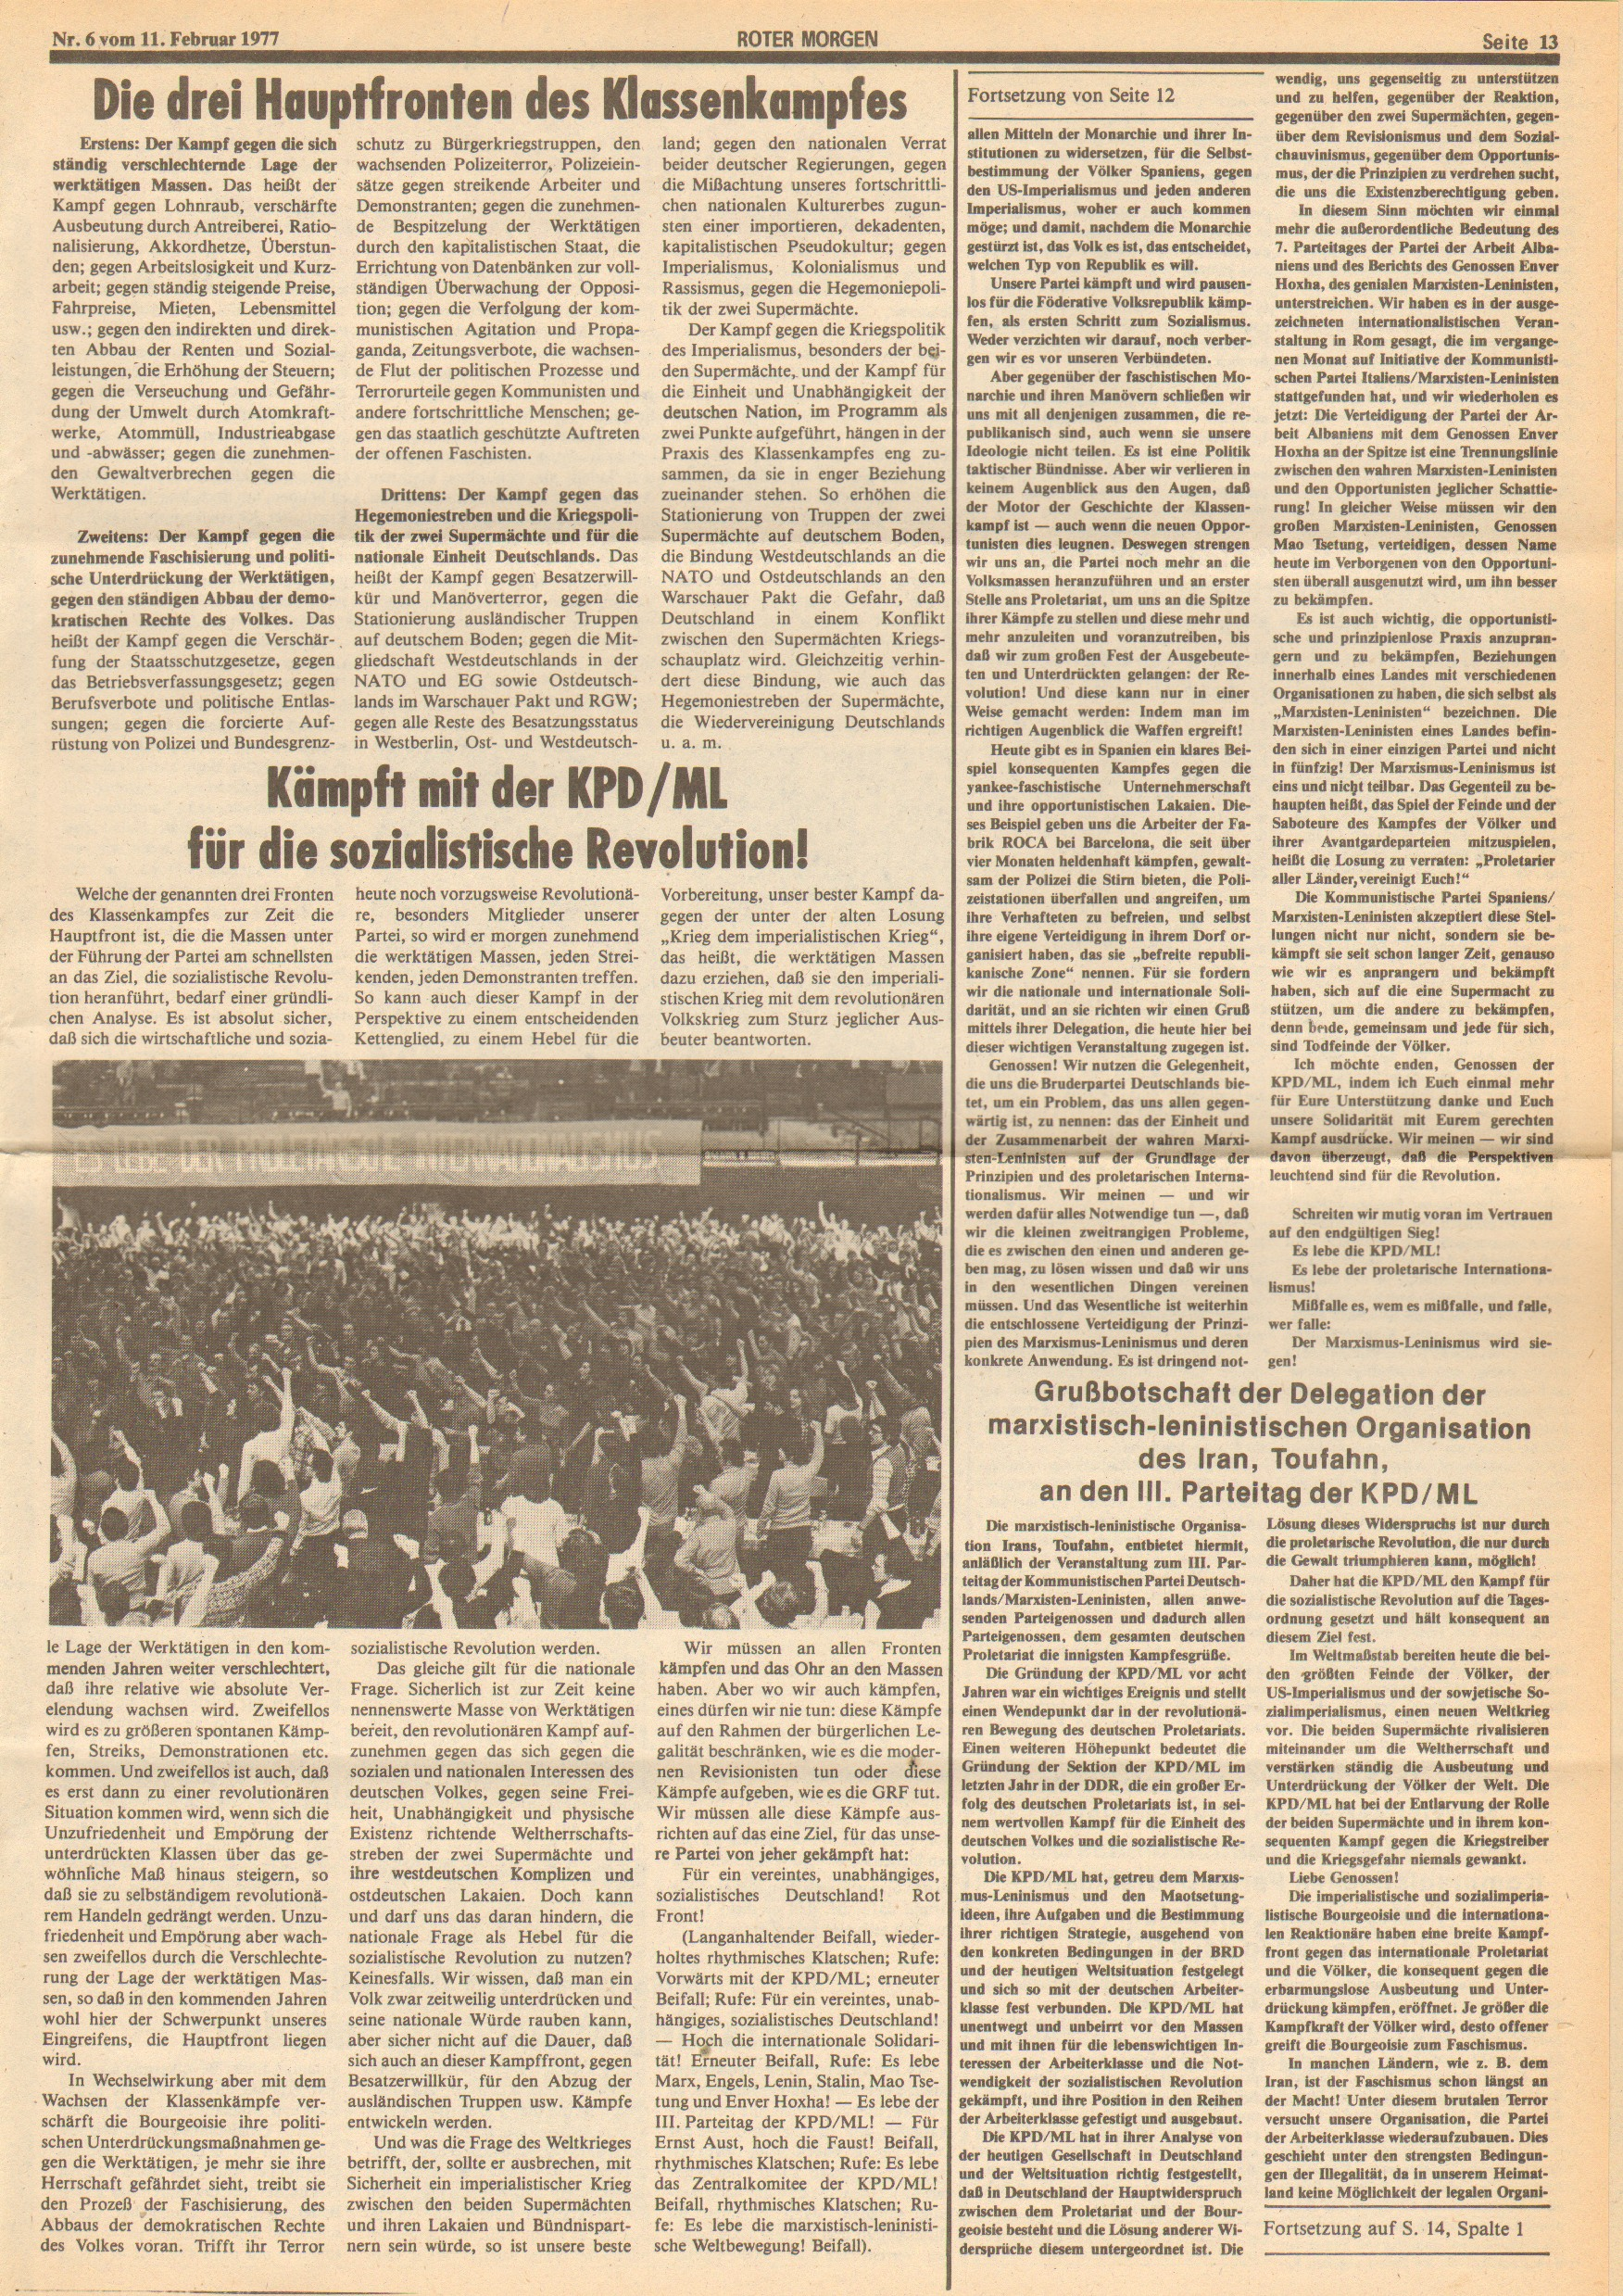 Roter Morgen, 11. Jg., 11. Februar 1977, Nr. 6, Seite 13